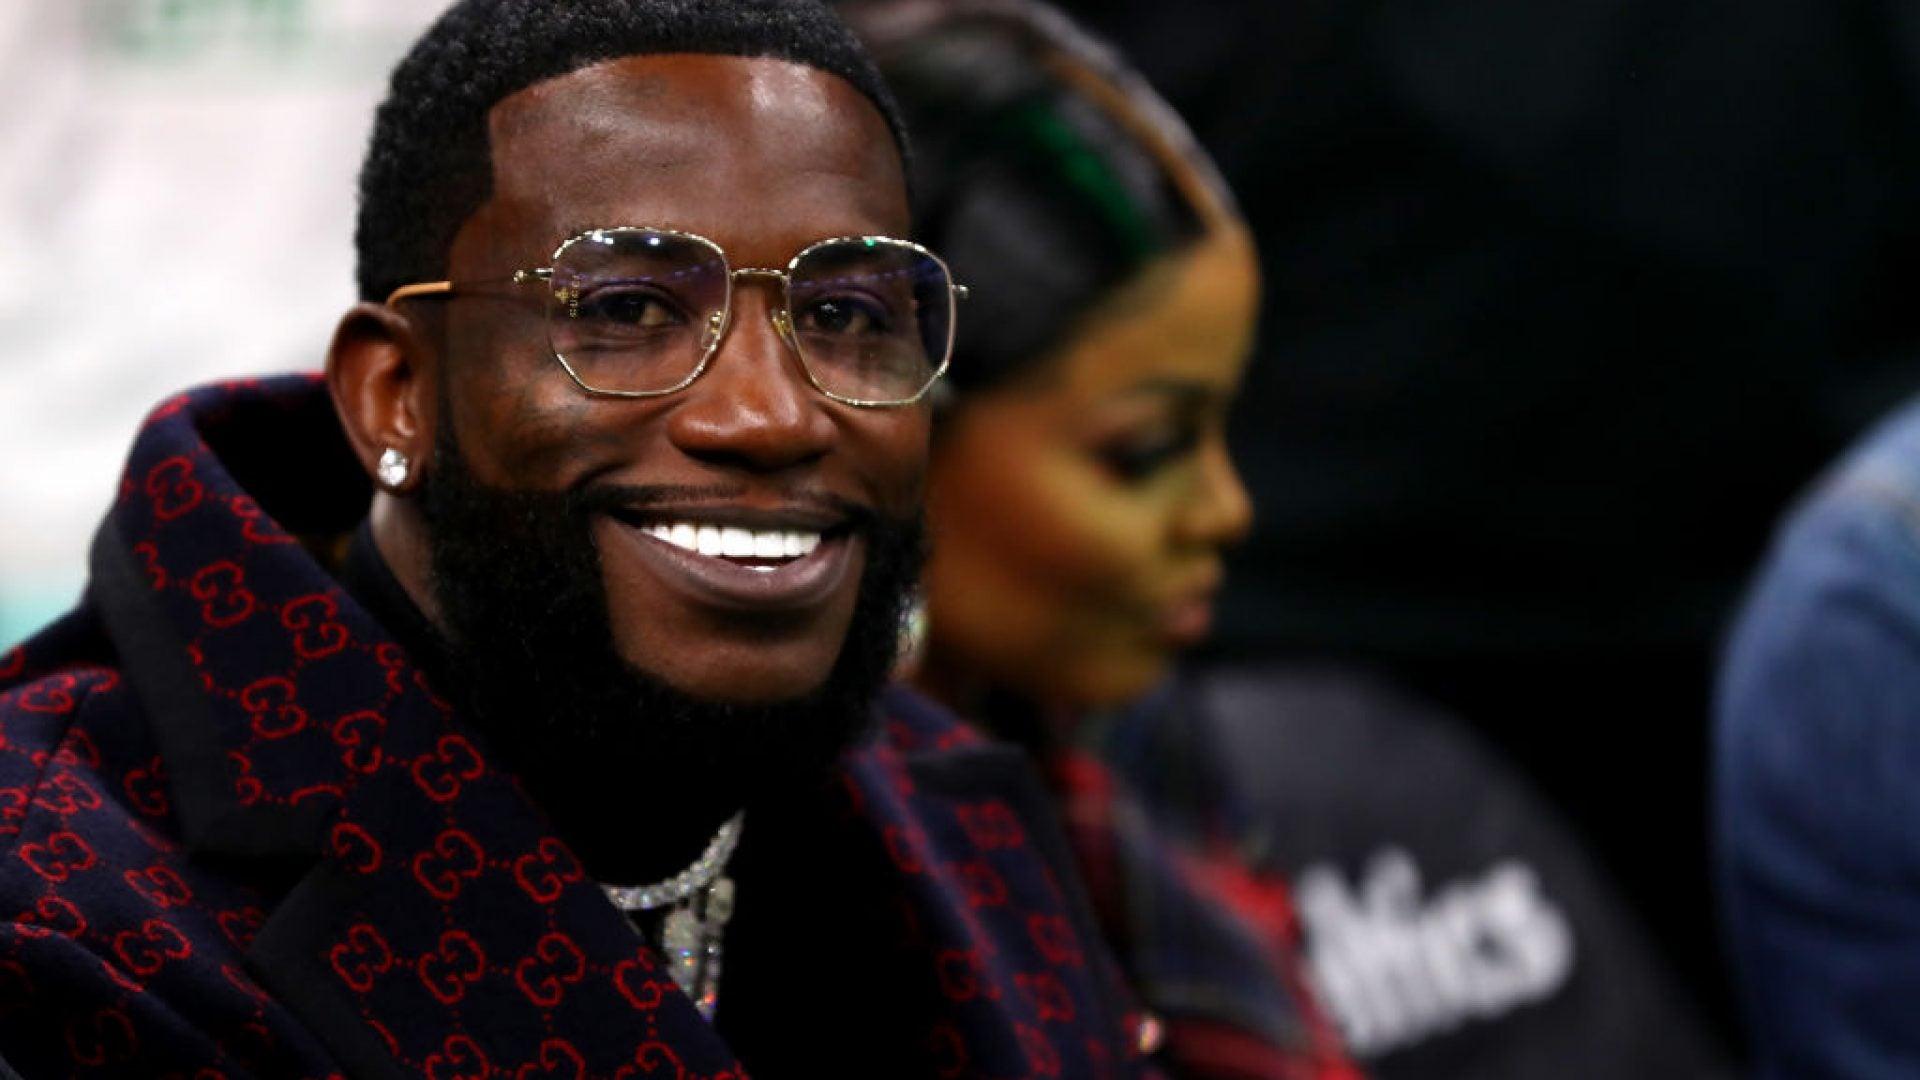 Gucci Mane Calls Atlantic Records 'Polite Racist,' Announces He's Leaving Label